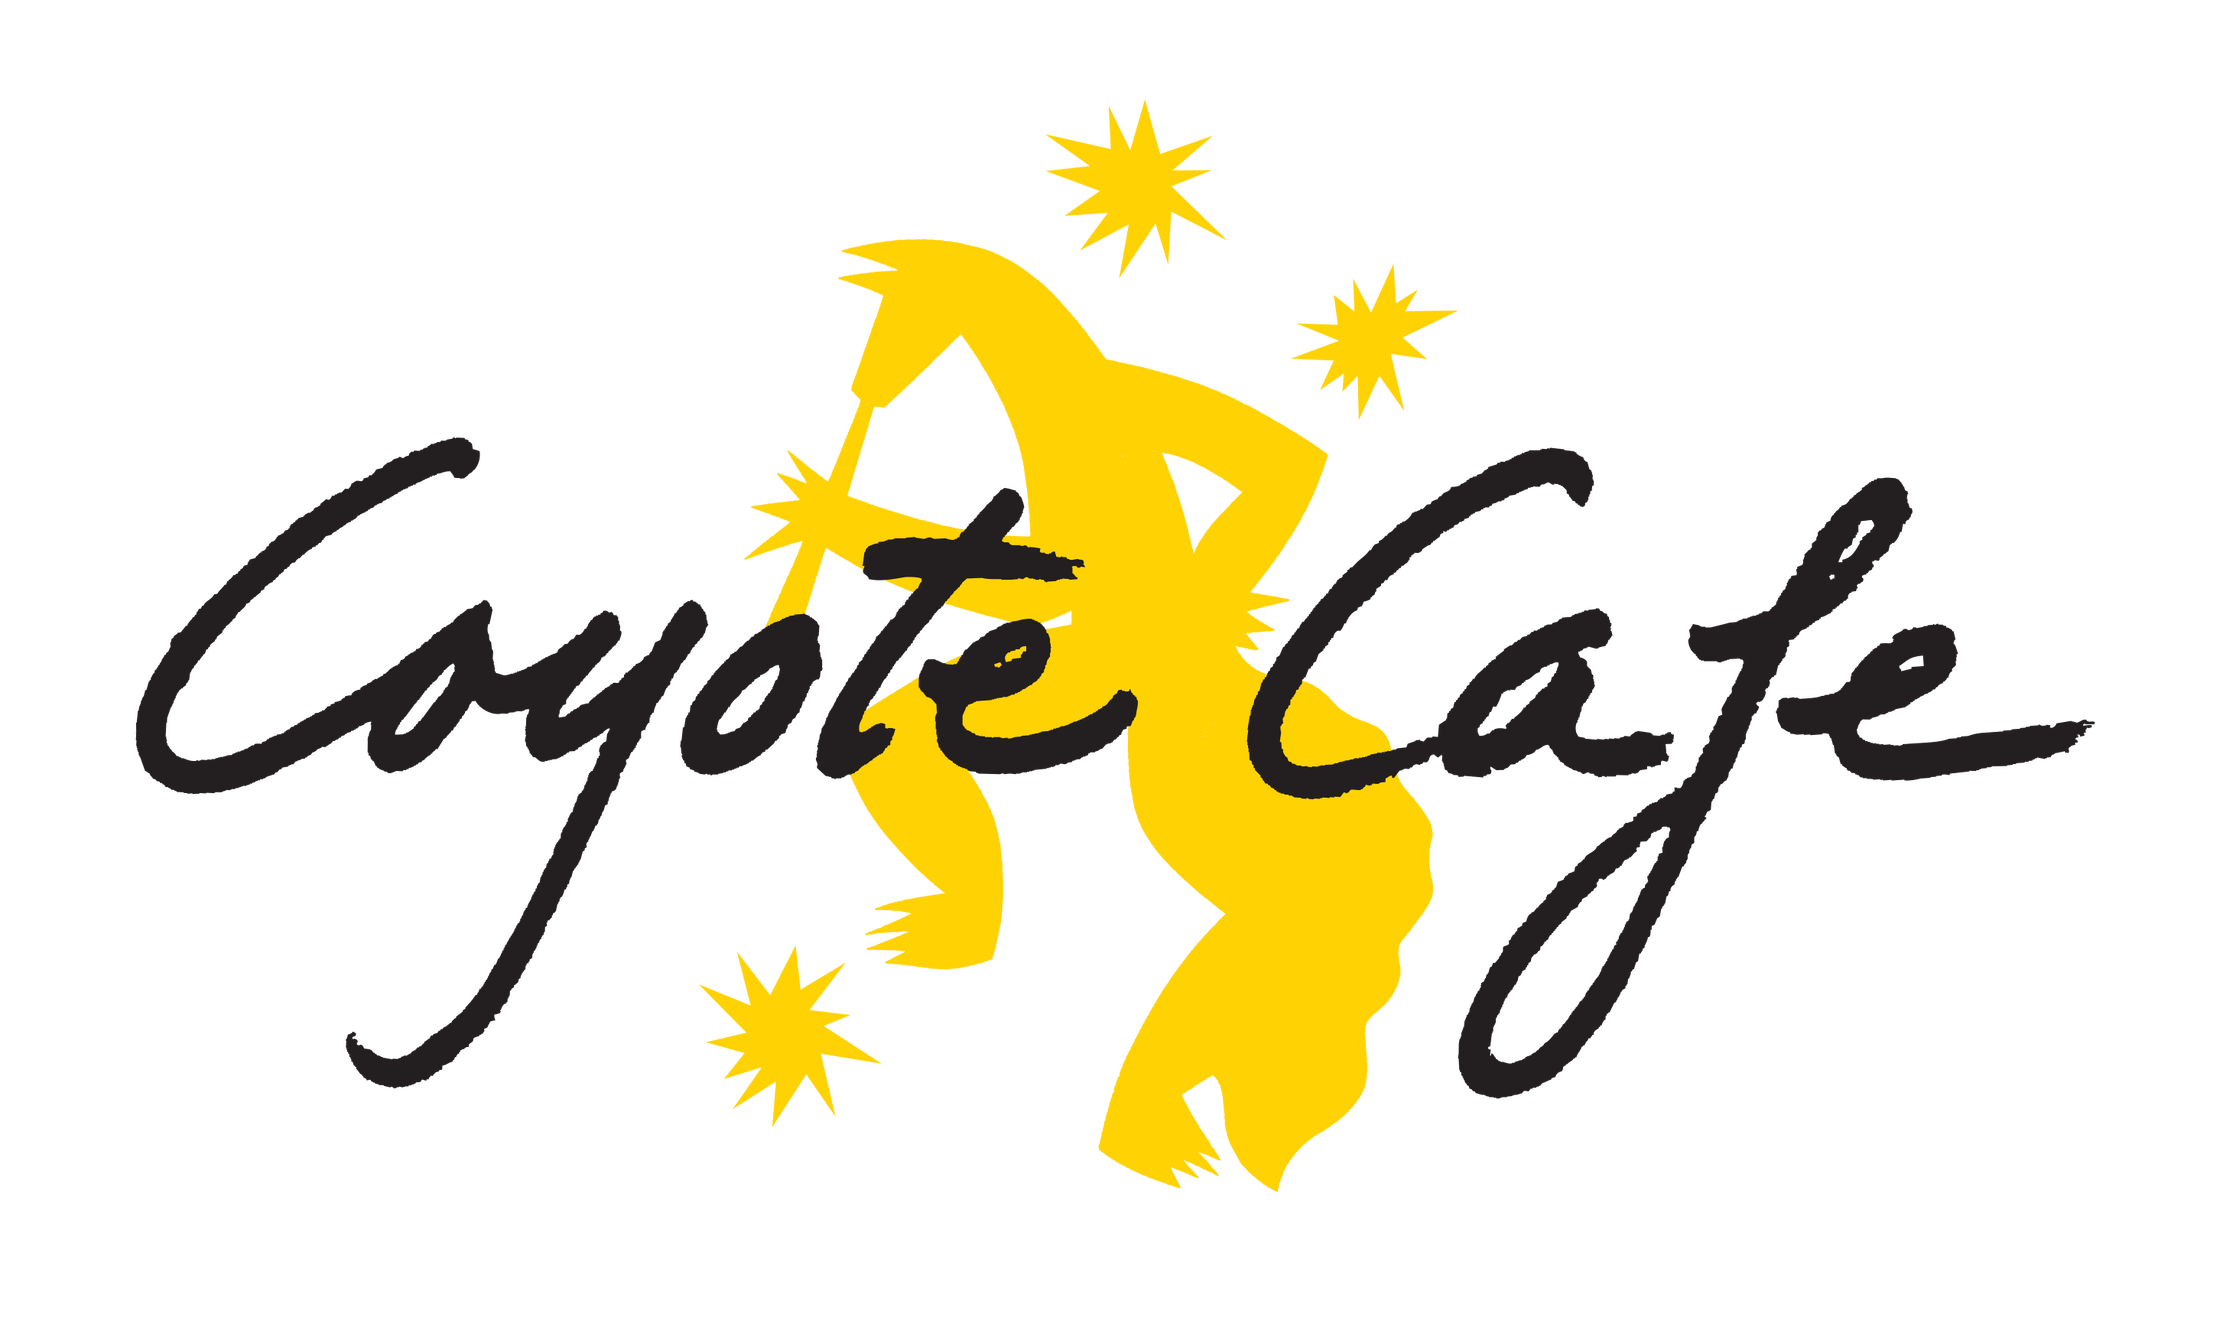 Coyote Cafe logo